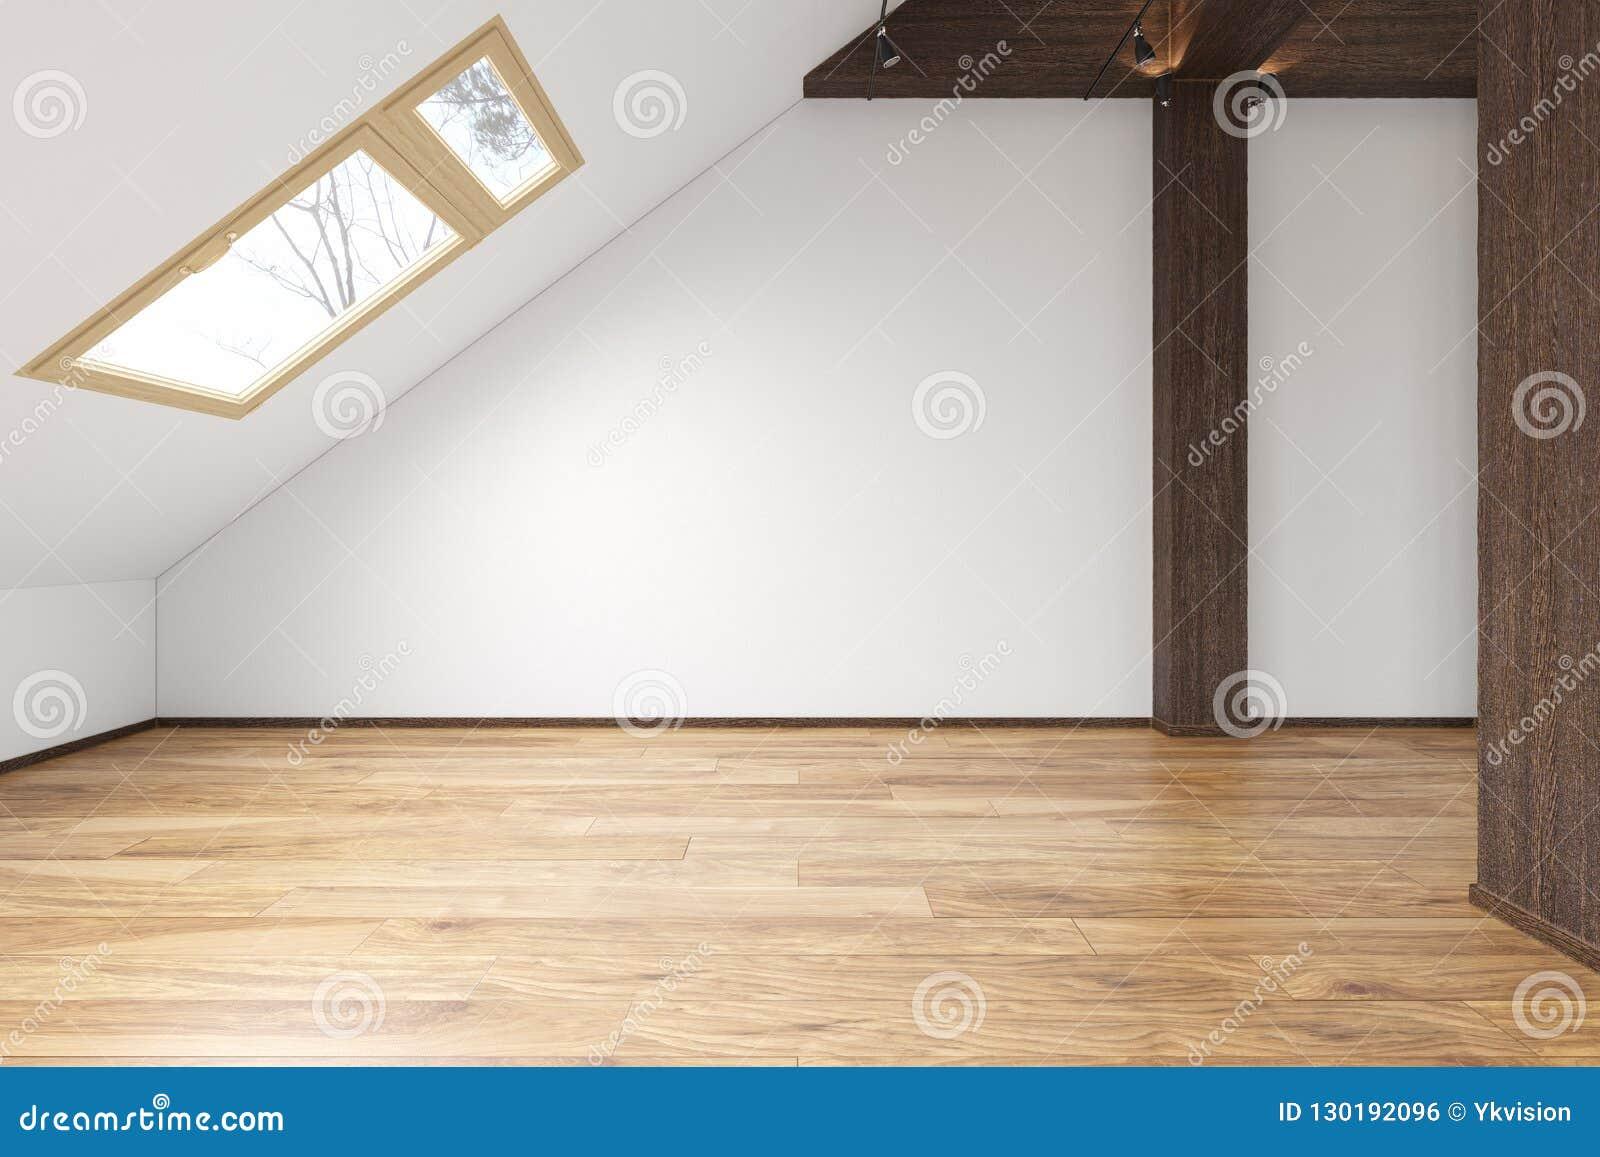 Attic Loft Open Space Empty Interior With Beams Windows Stairway Wooden Floor Stock Illustration Illustration Of Empty Inside 130192096